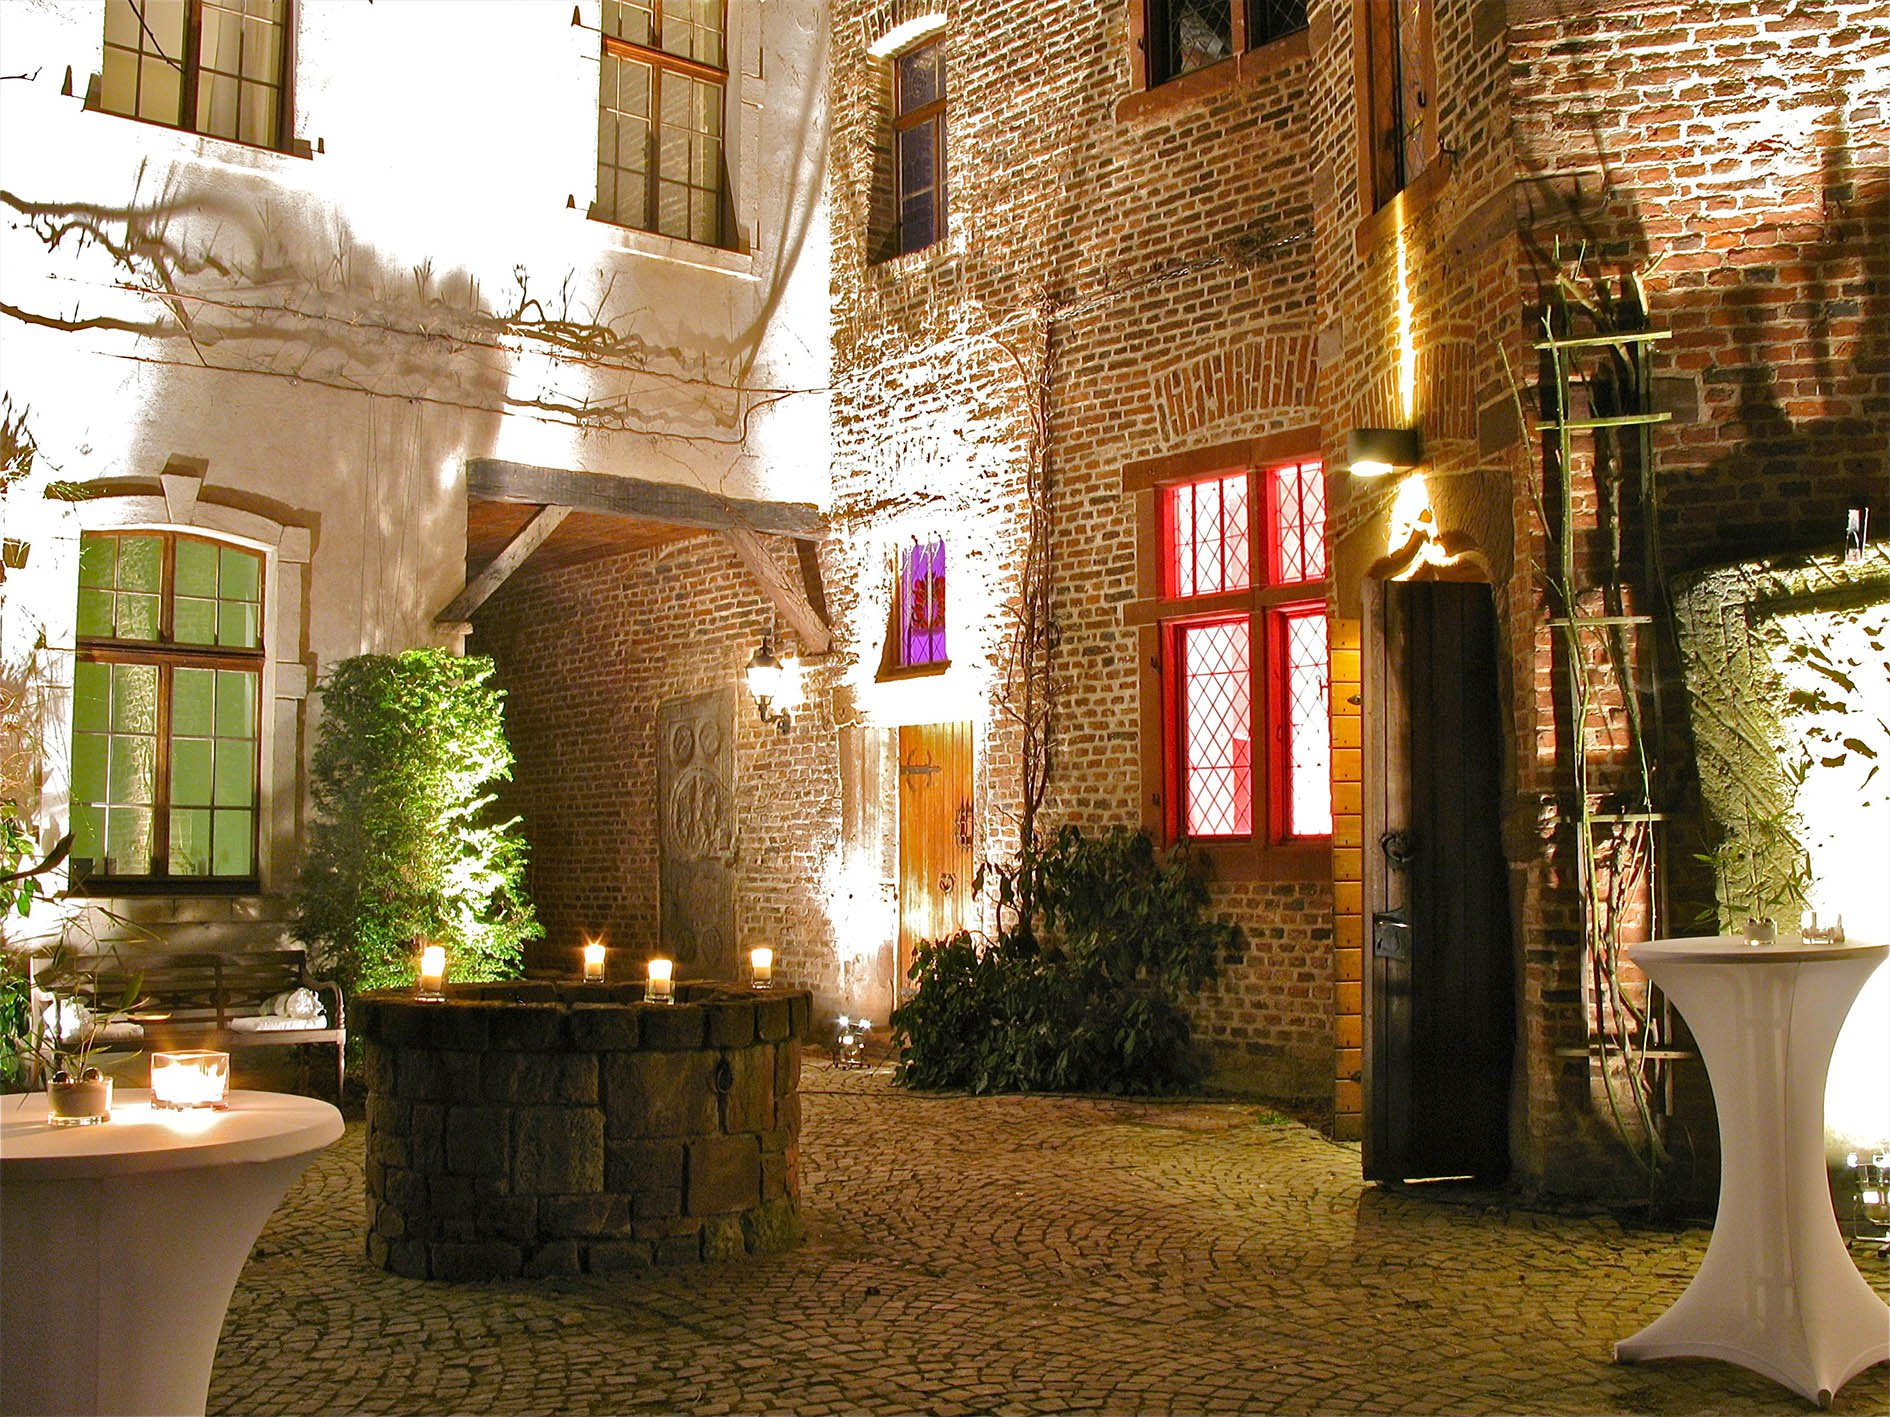 Burg Innenhof